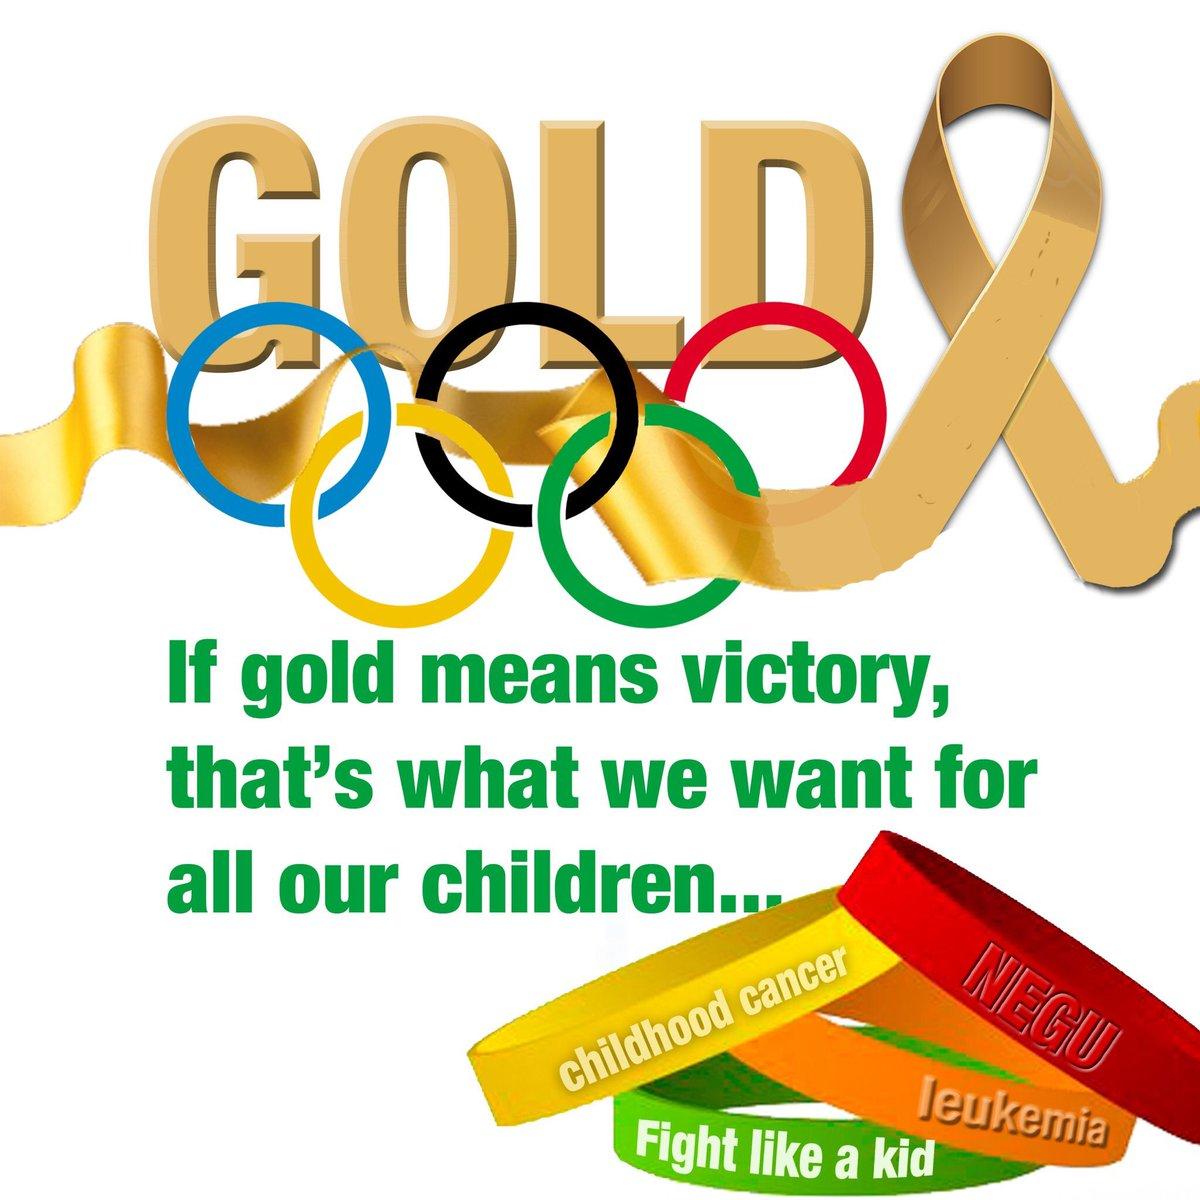 "Dear @twitter Please make a #Goldribbon pop up after hashtags of ""Gold"" in Sept! #ChildhoodCancer --via @JoeBaber1 https://t.co/lktNiNF67q"